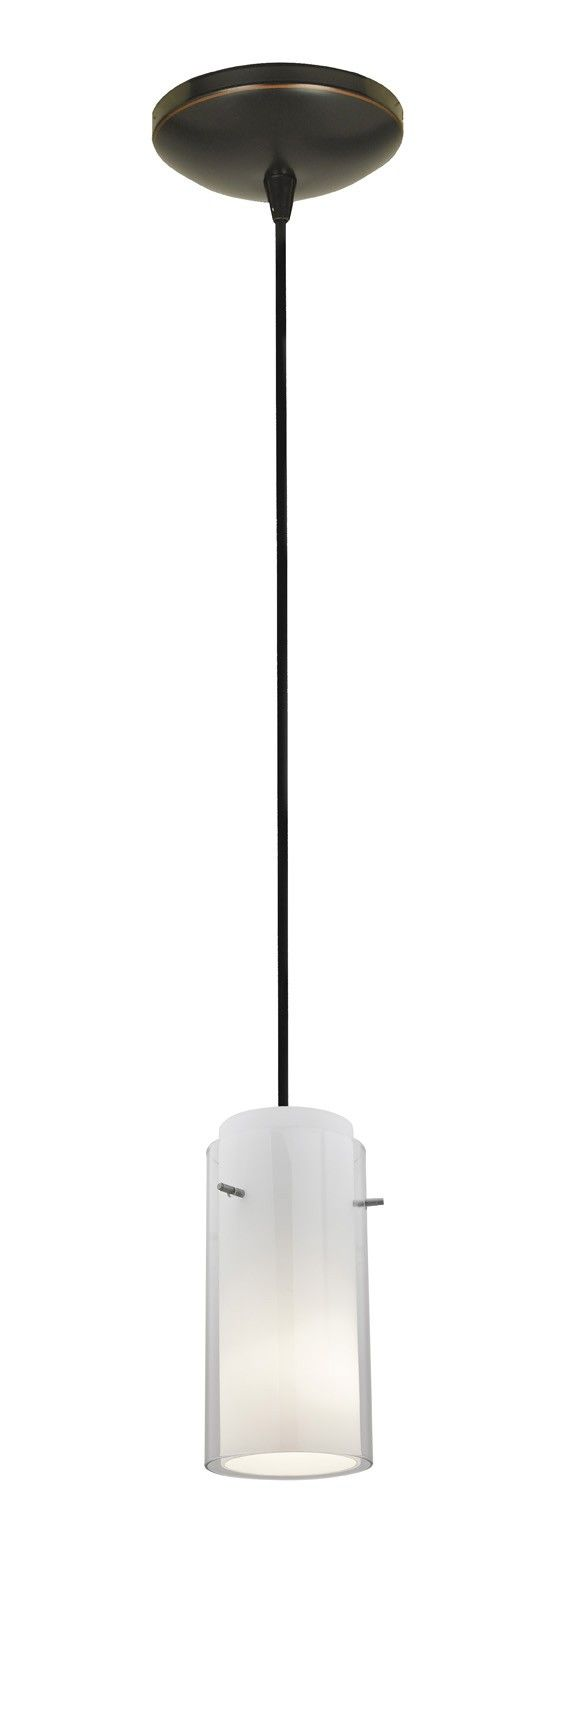 Access Lighting 28033-1C-BS/CLCB Sydney Glass in Glass Cylinder Pendant